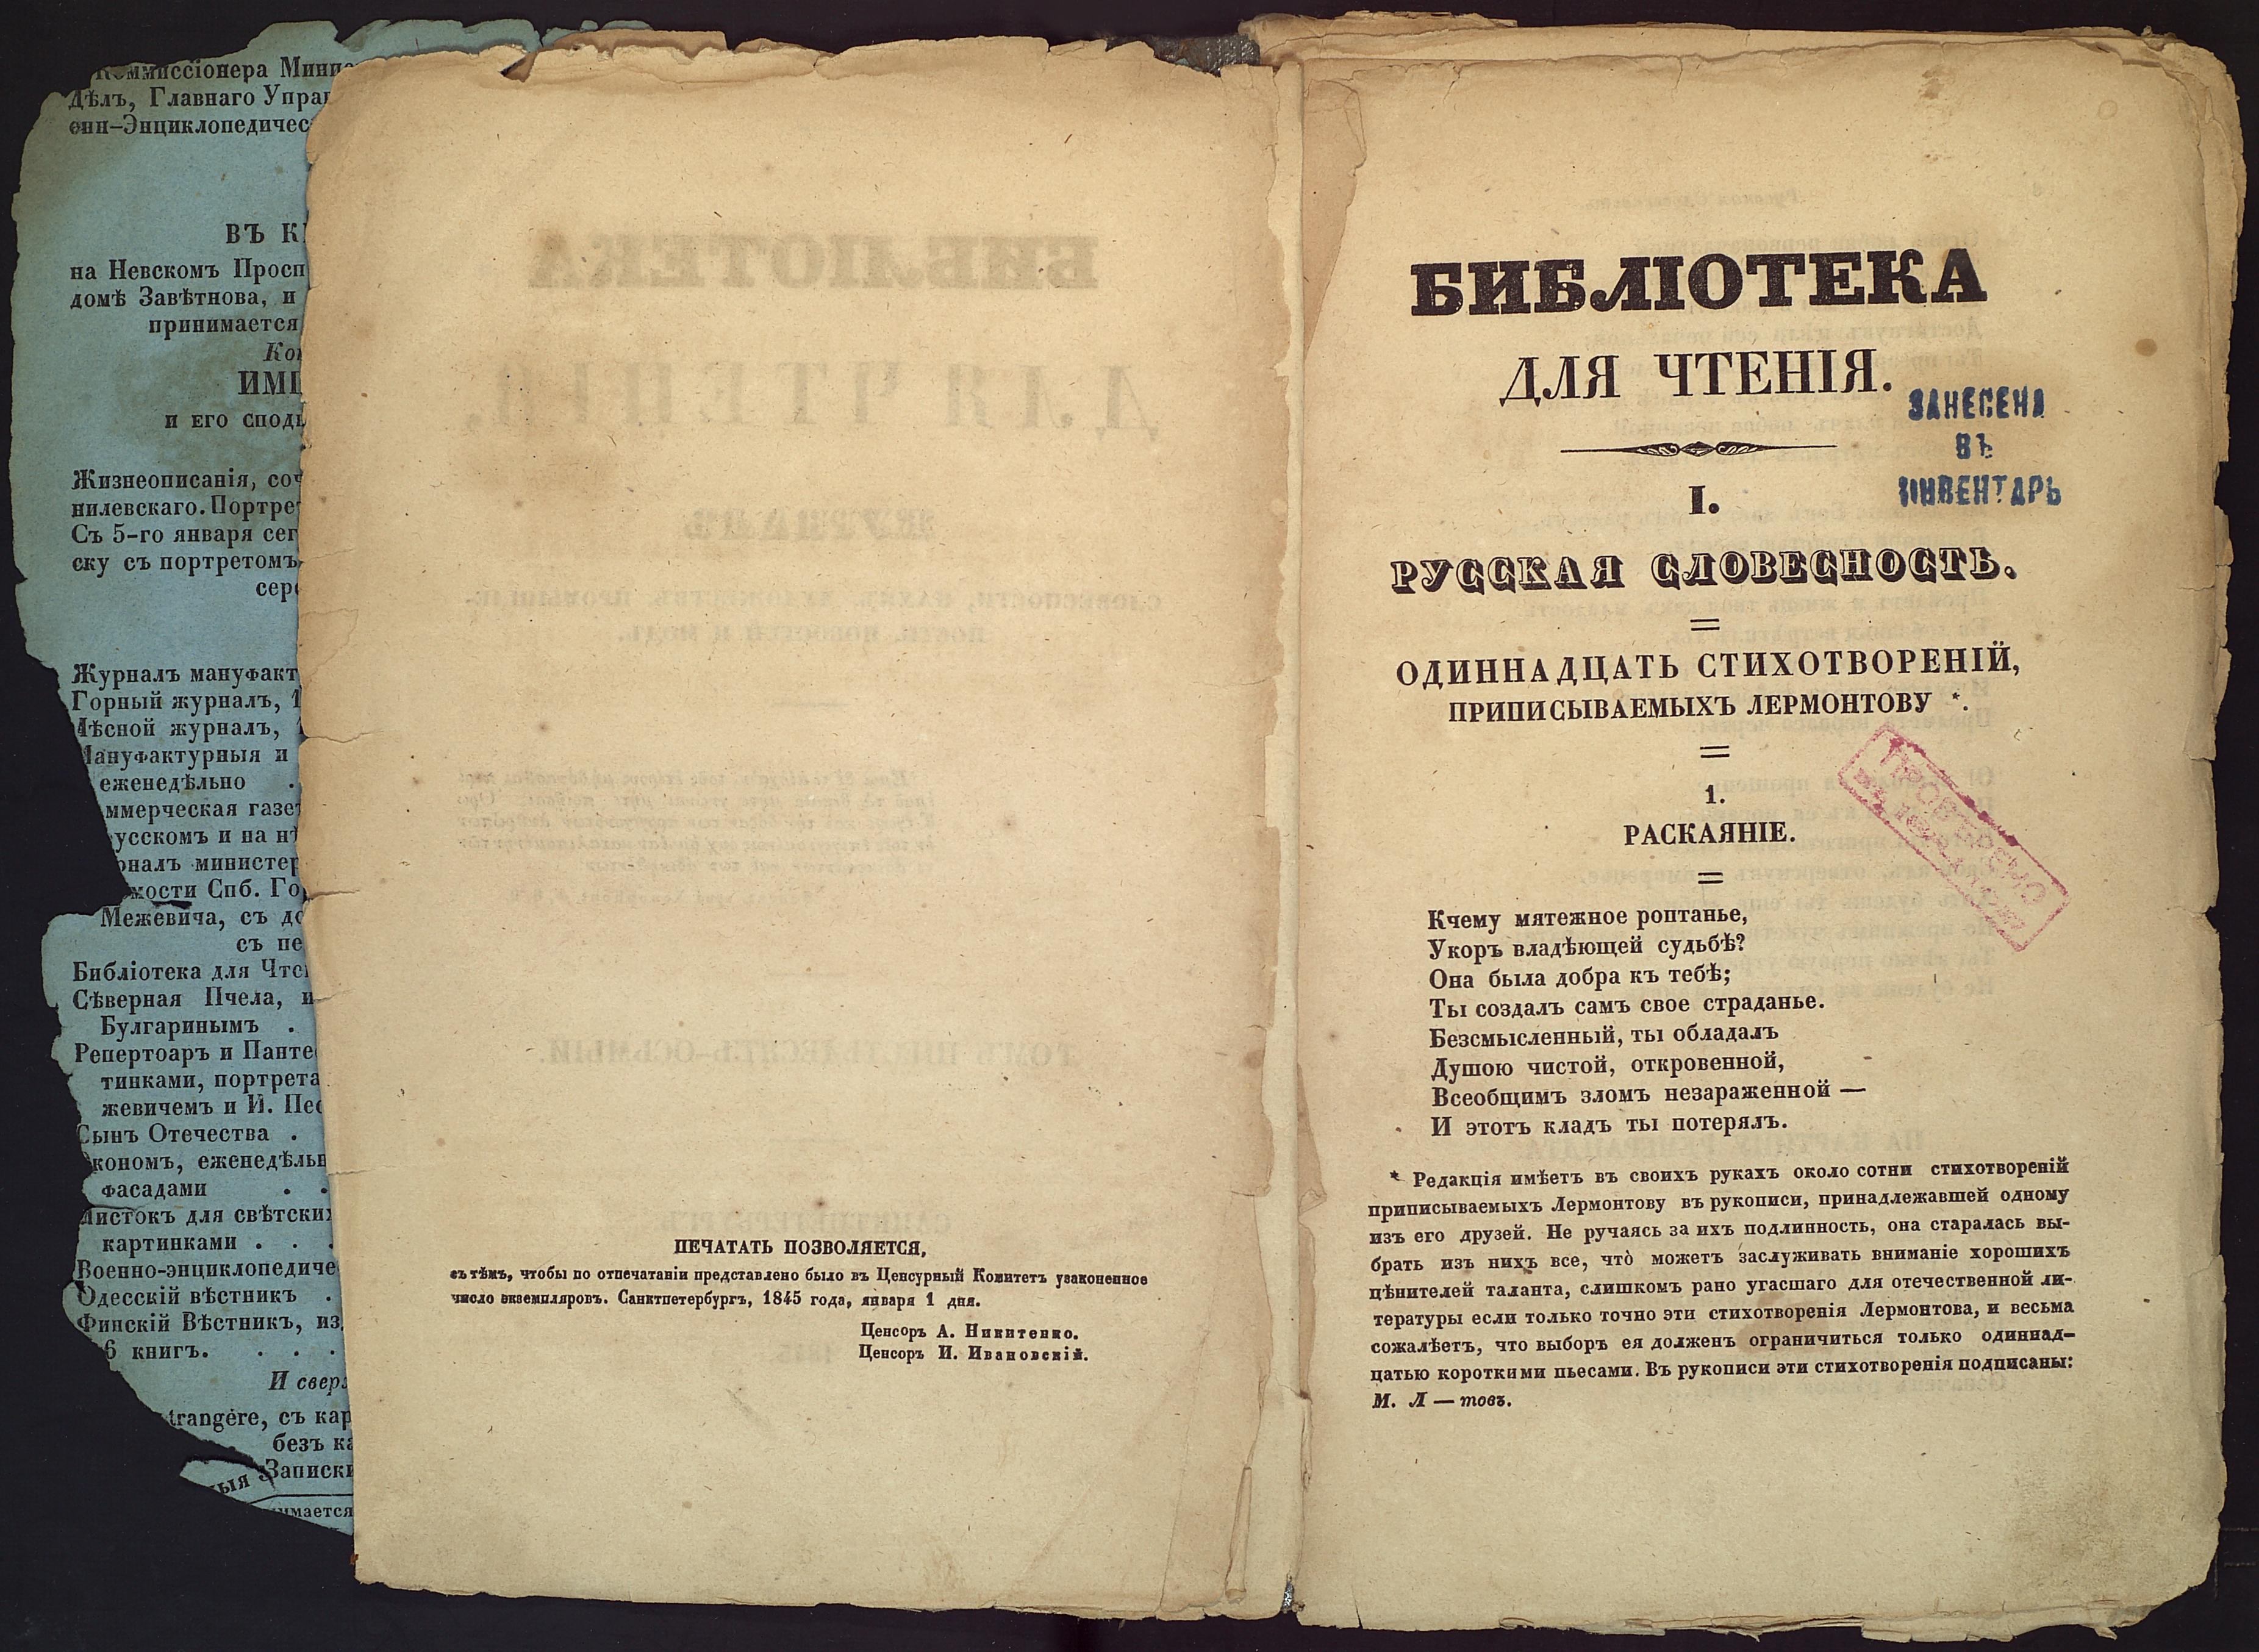 ЛОК-5119 ТАРХАНЫ КП-11026  Журнал Библиотека для чтения. Т. 68._2